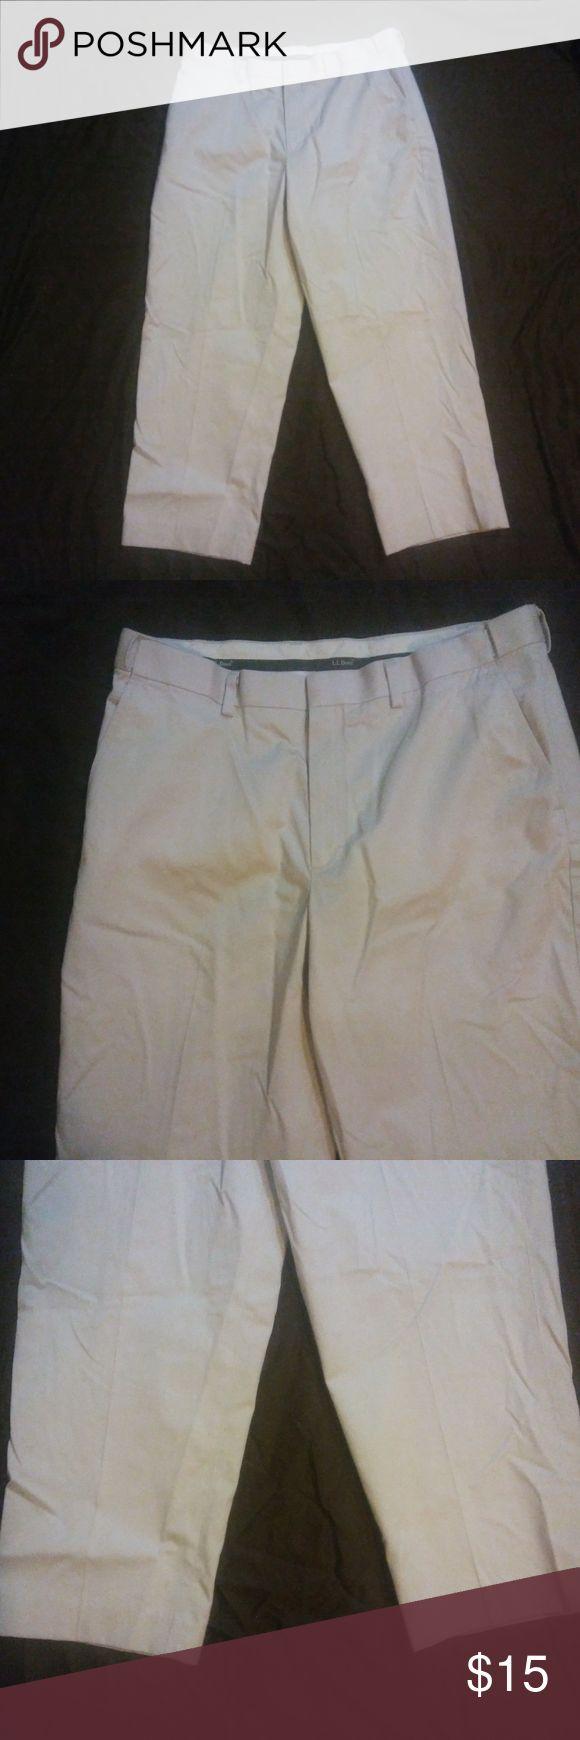 LL Bean Men's Dress Chinos Comfort Waist 37-28 LL Bean Men's Dress Chinos Hidden Comfort Waist Khaki 37-28 L.L. Bean Pants Chinos & Khakis